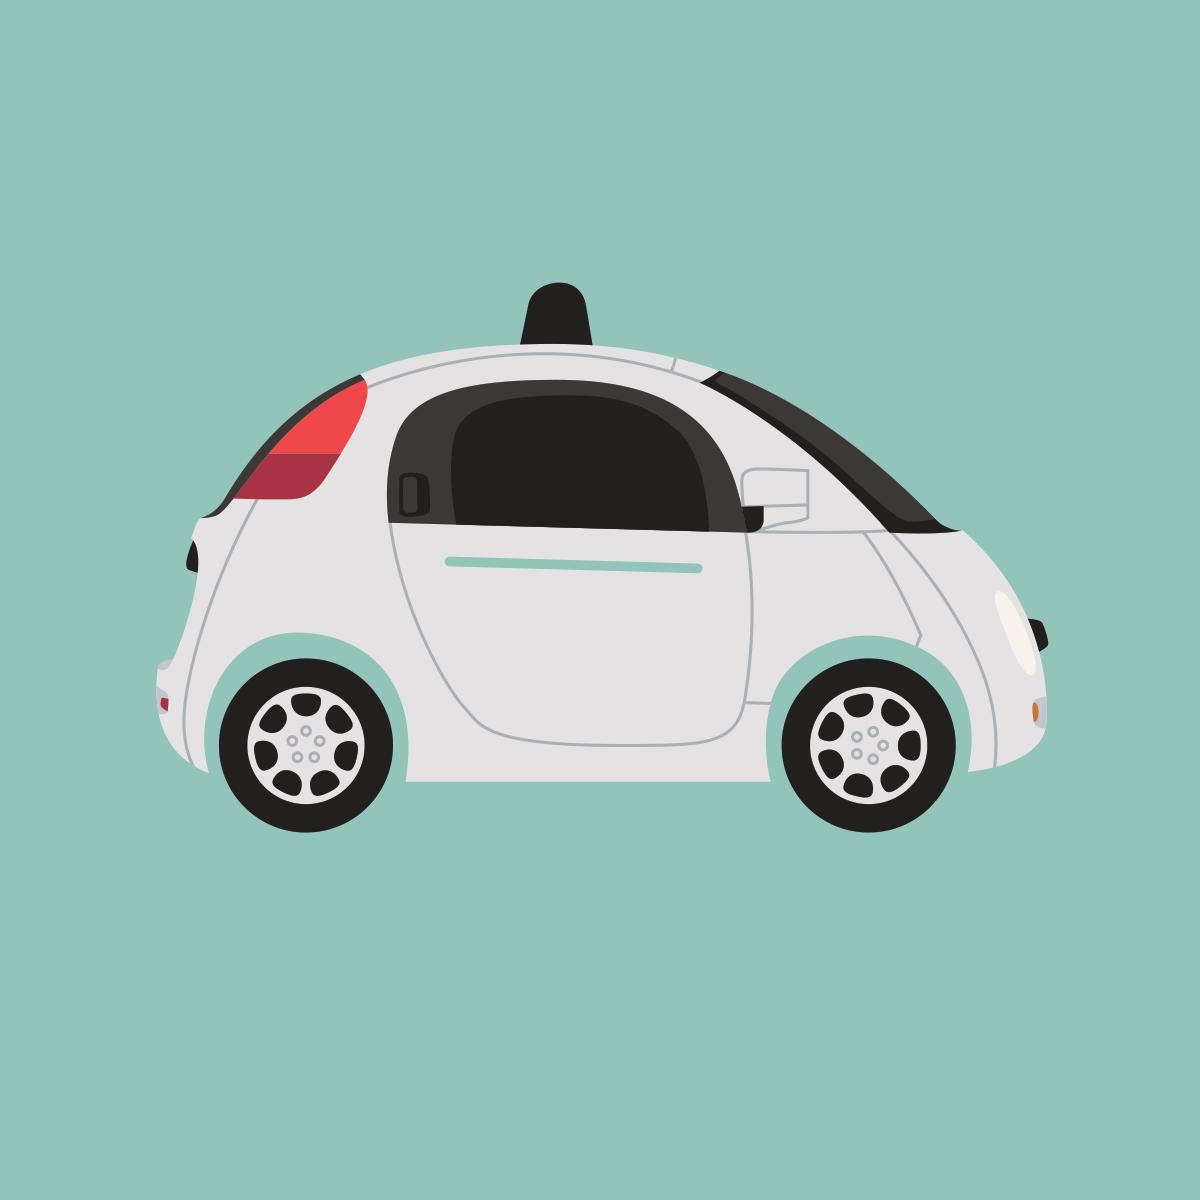 72 driverless cars